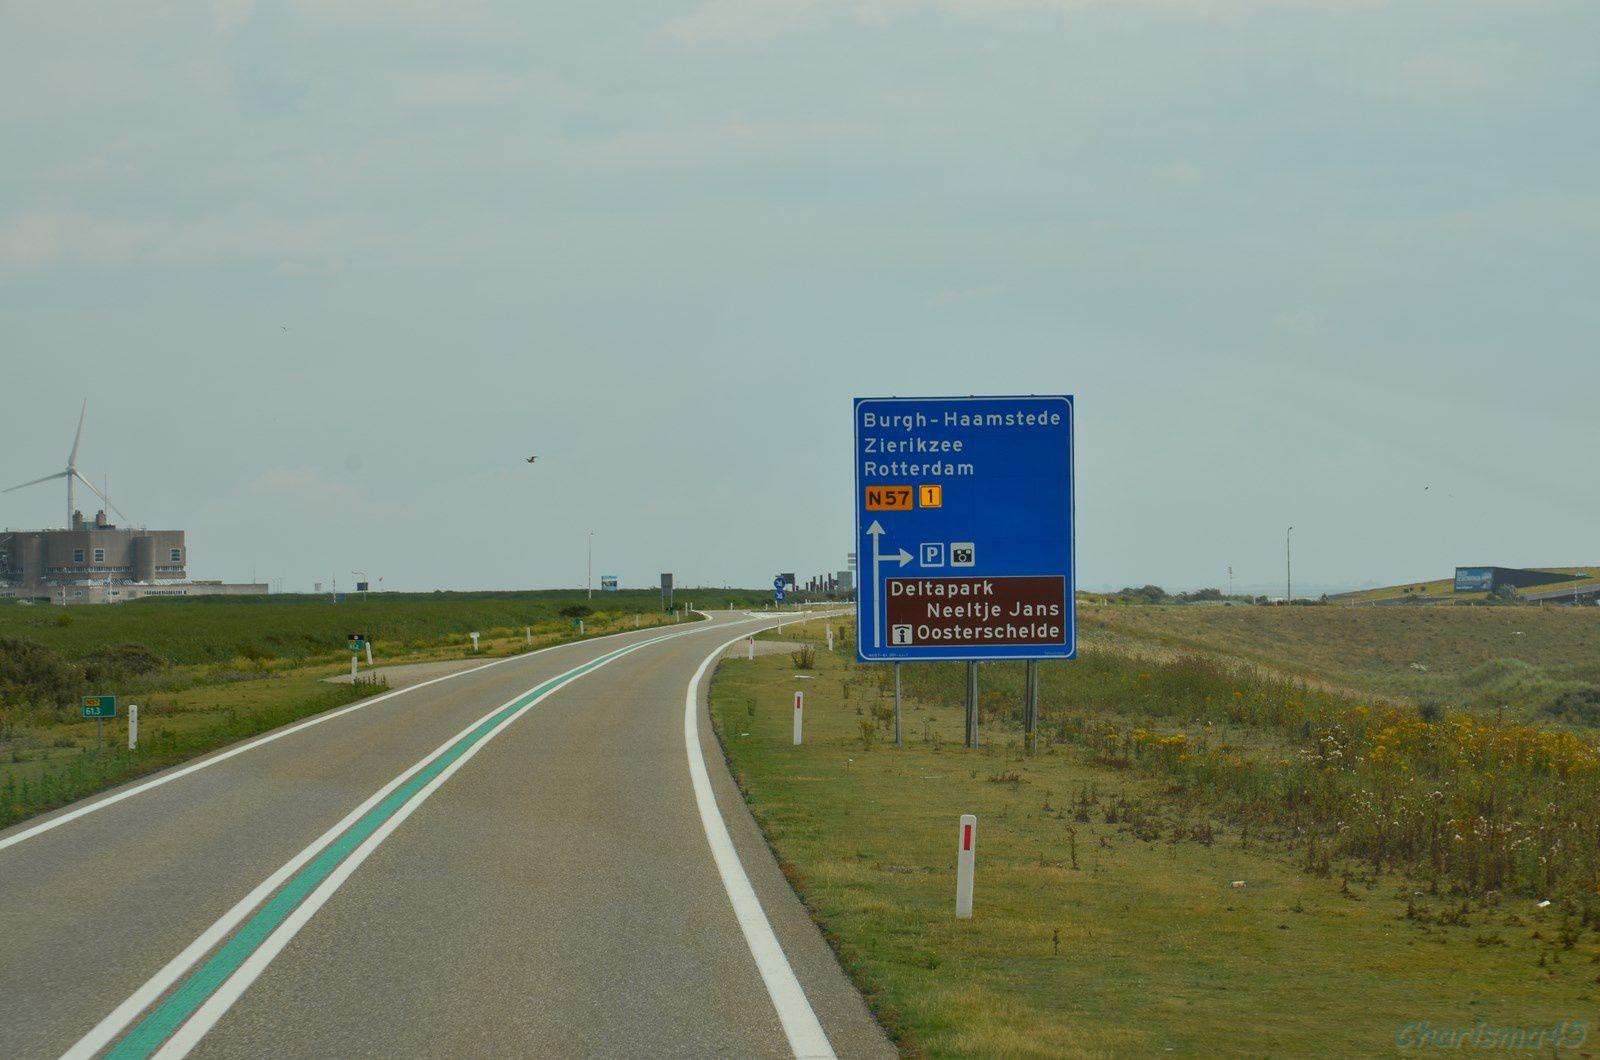 De Middelburg à Kinderdijk